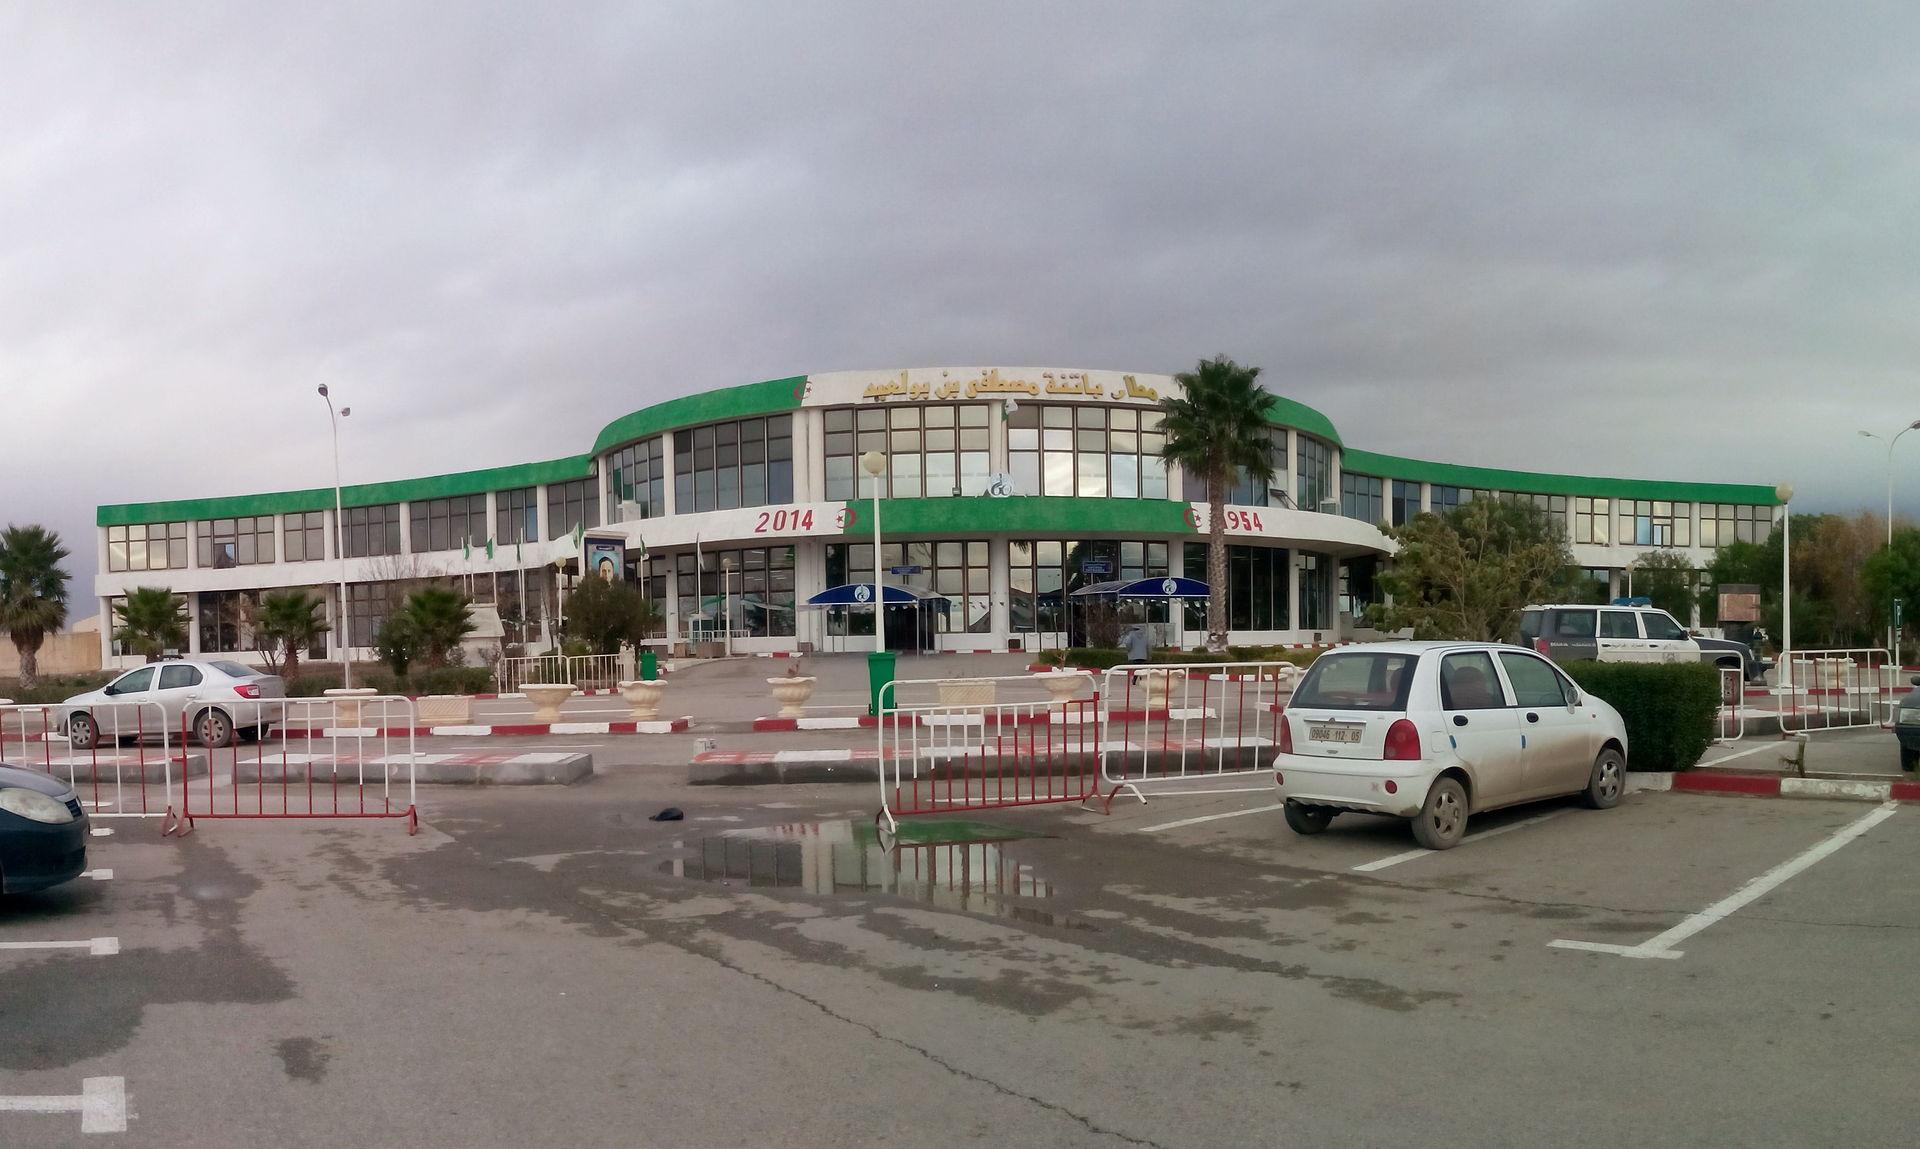 Hotel Marseille Aeroport Pas Cher